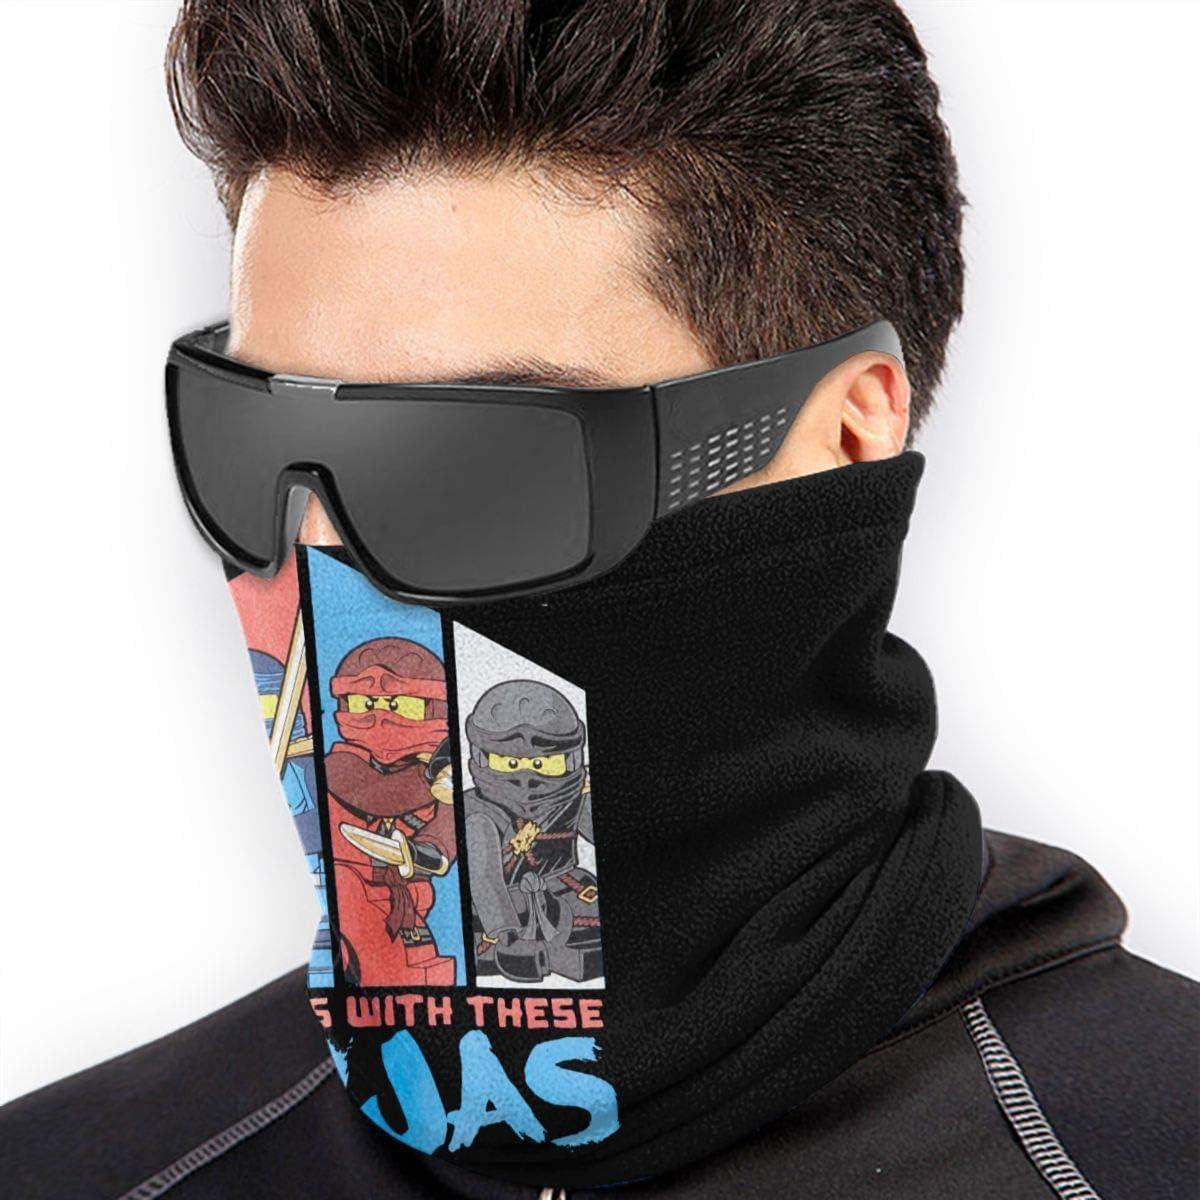 Eopro Ninjago Unisex Mikrofaser Face M Ask Bandanas Multifunktionstuch Halstuch Halstuch Sturmmaske Bekleidung